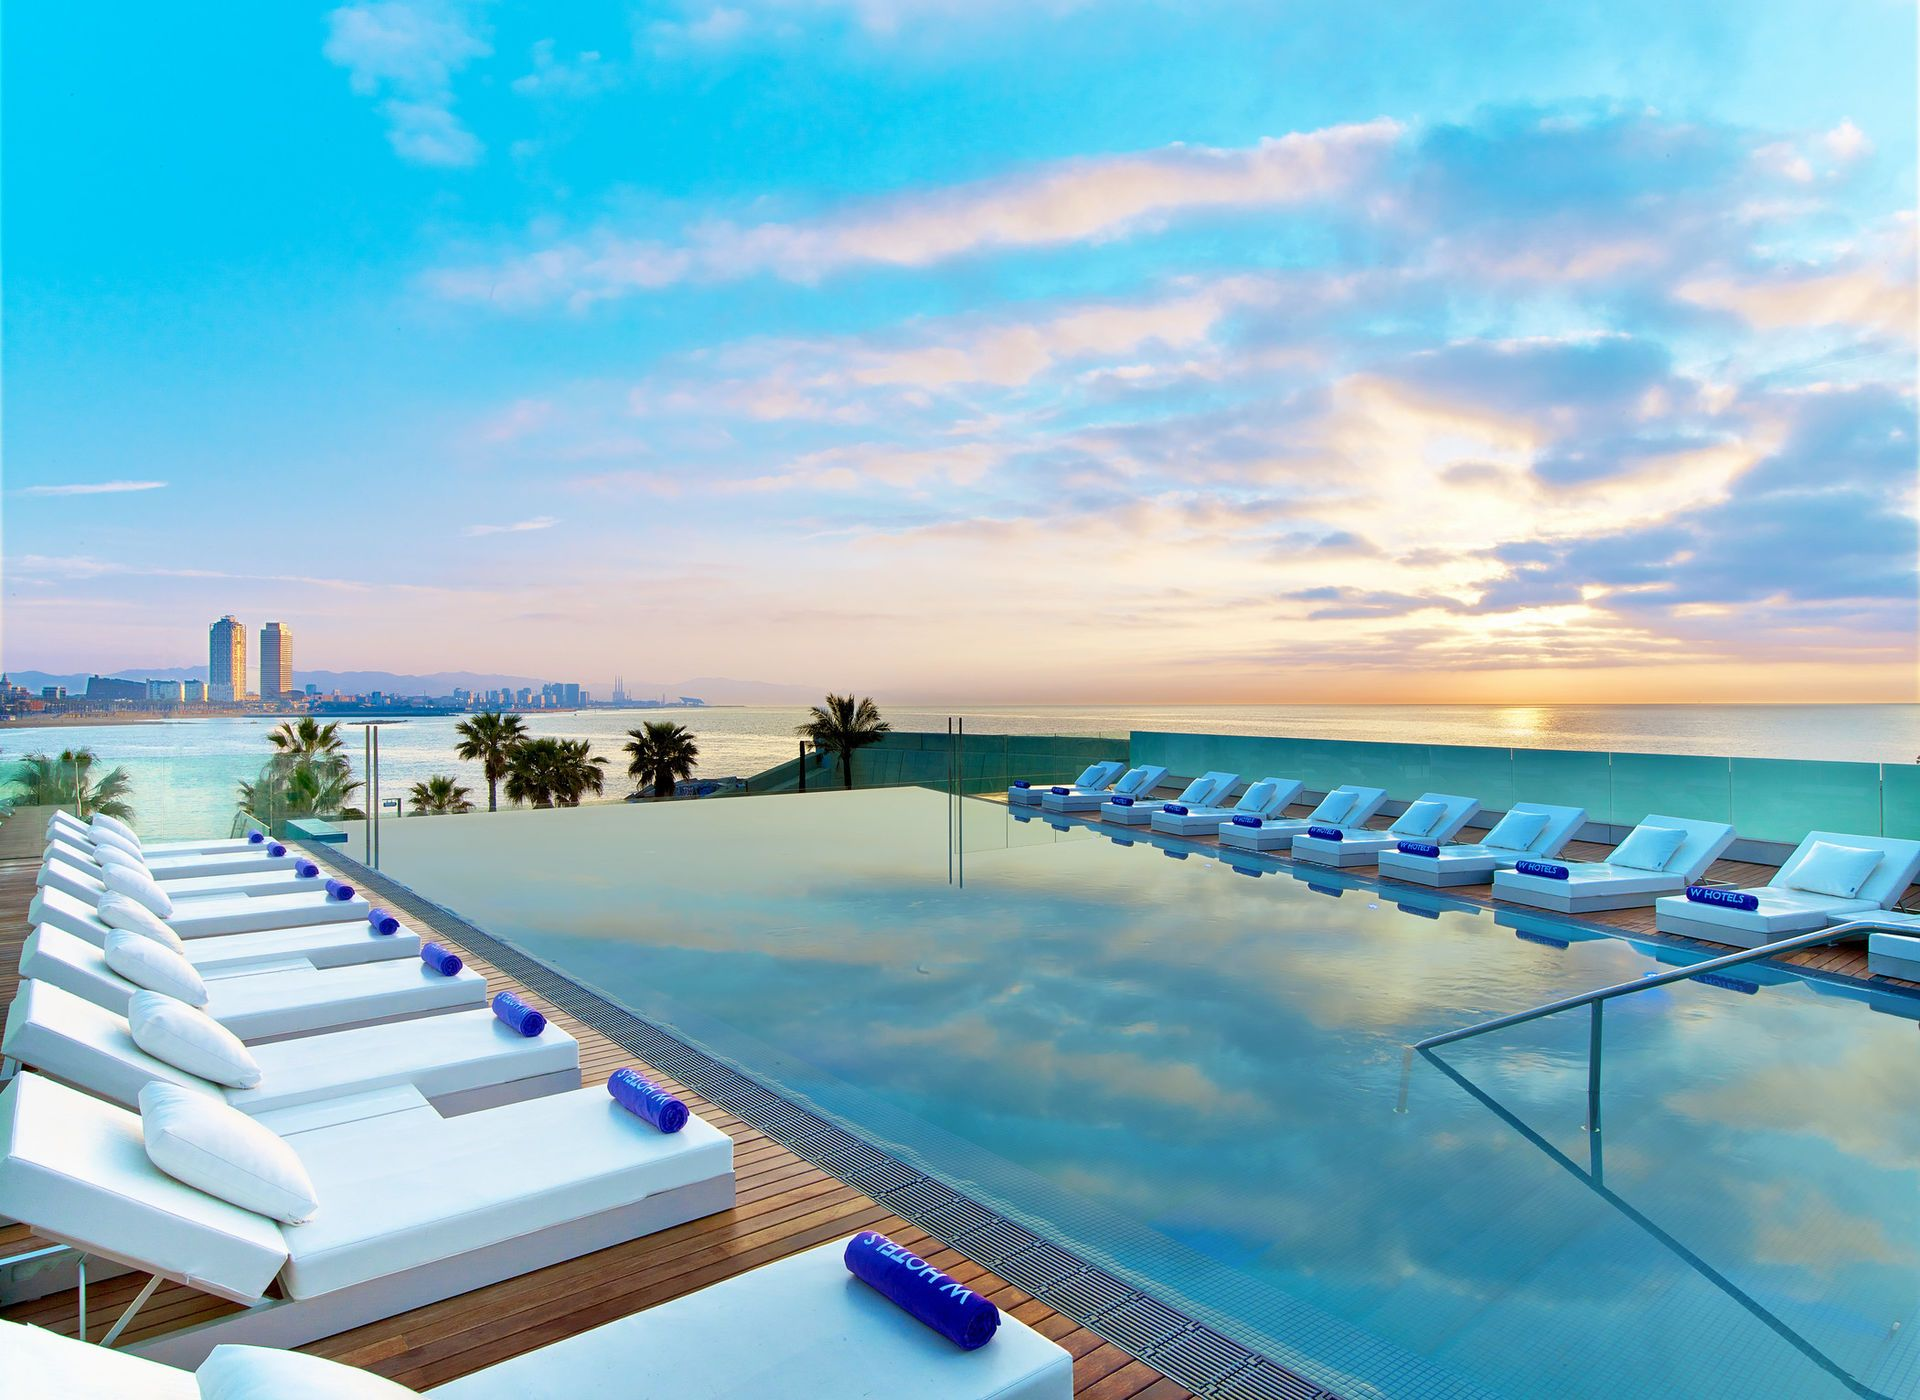 11 Most Stunning Waterfront Hotels In Europe Jetsetter Barcelona Hotels W Hotel Barcelona Best Hotels